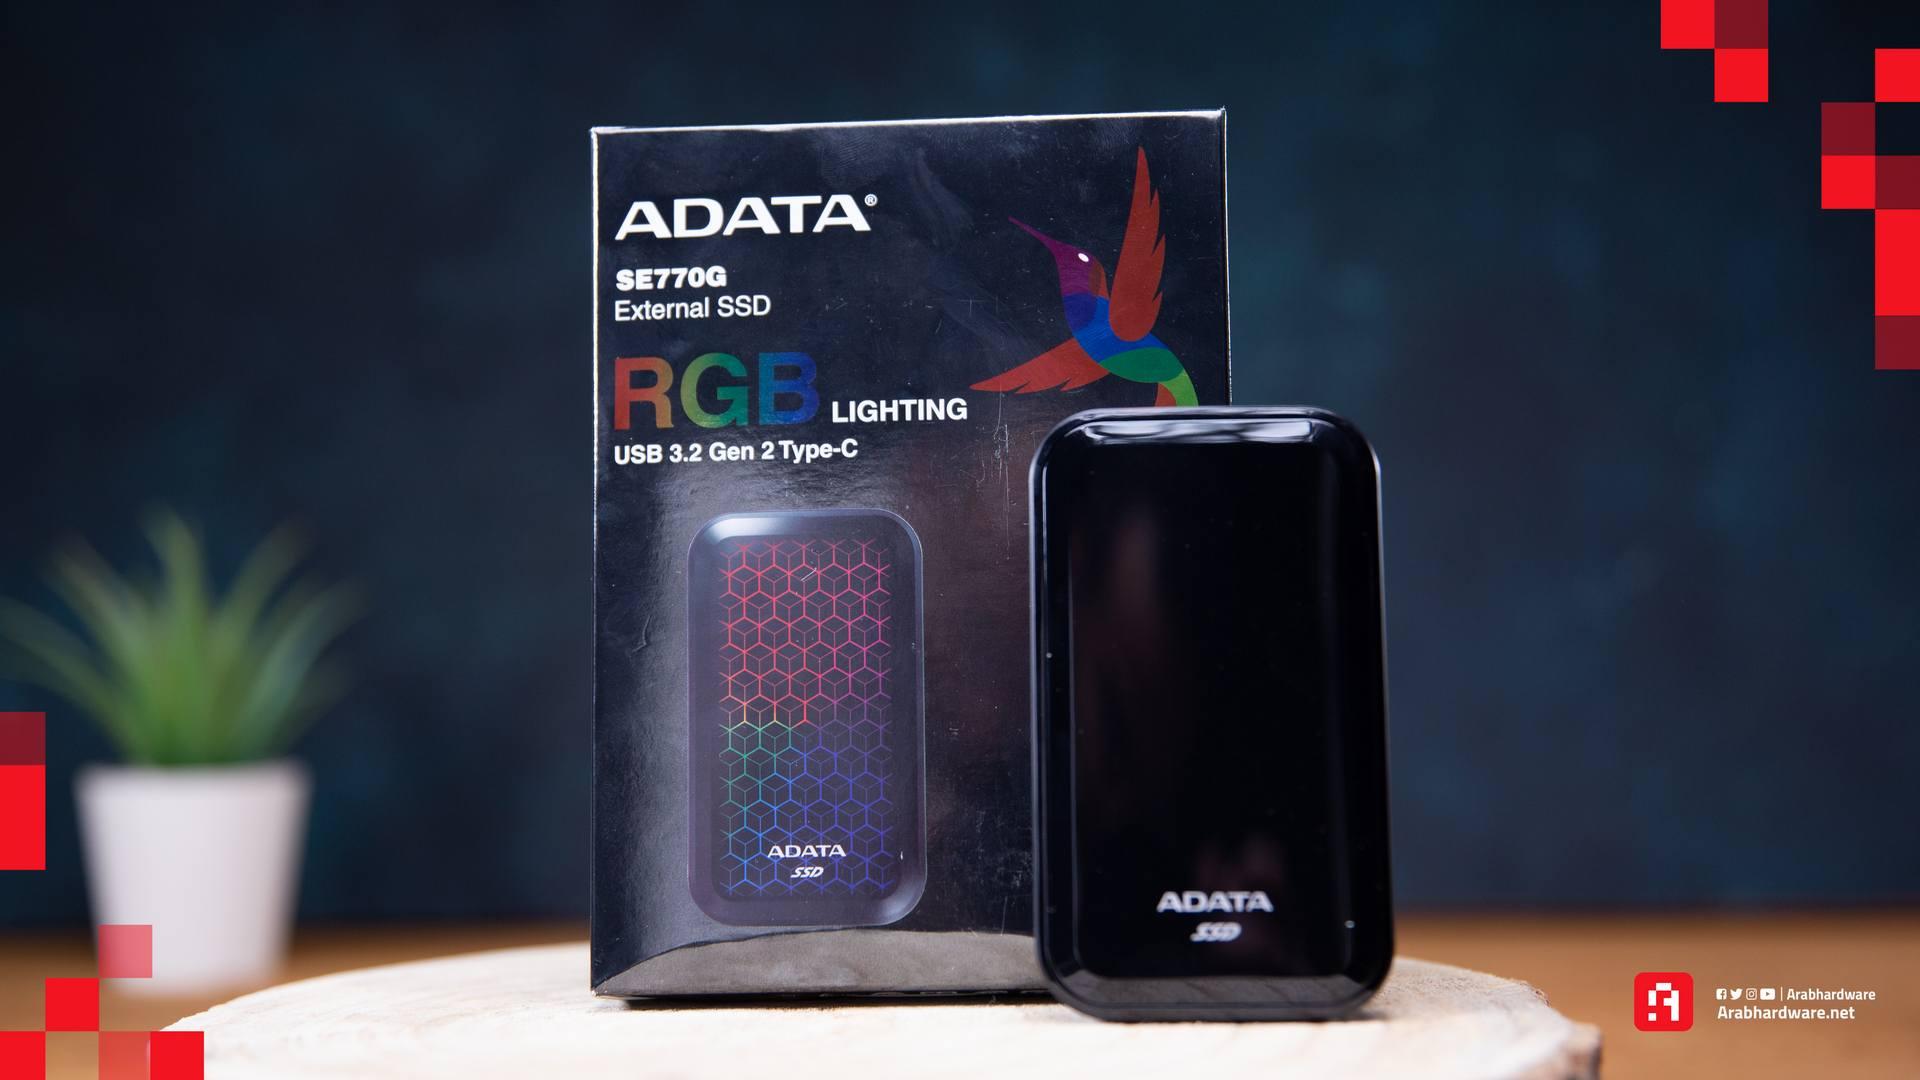 ADATA SE770G 1TB (10) SSD